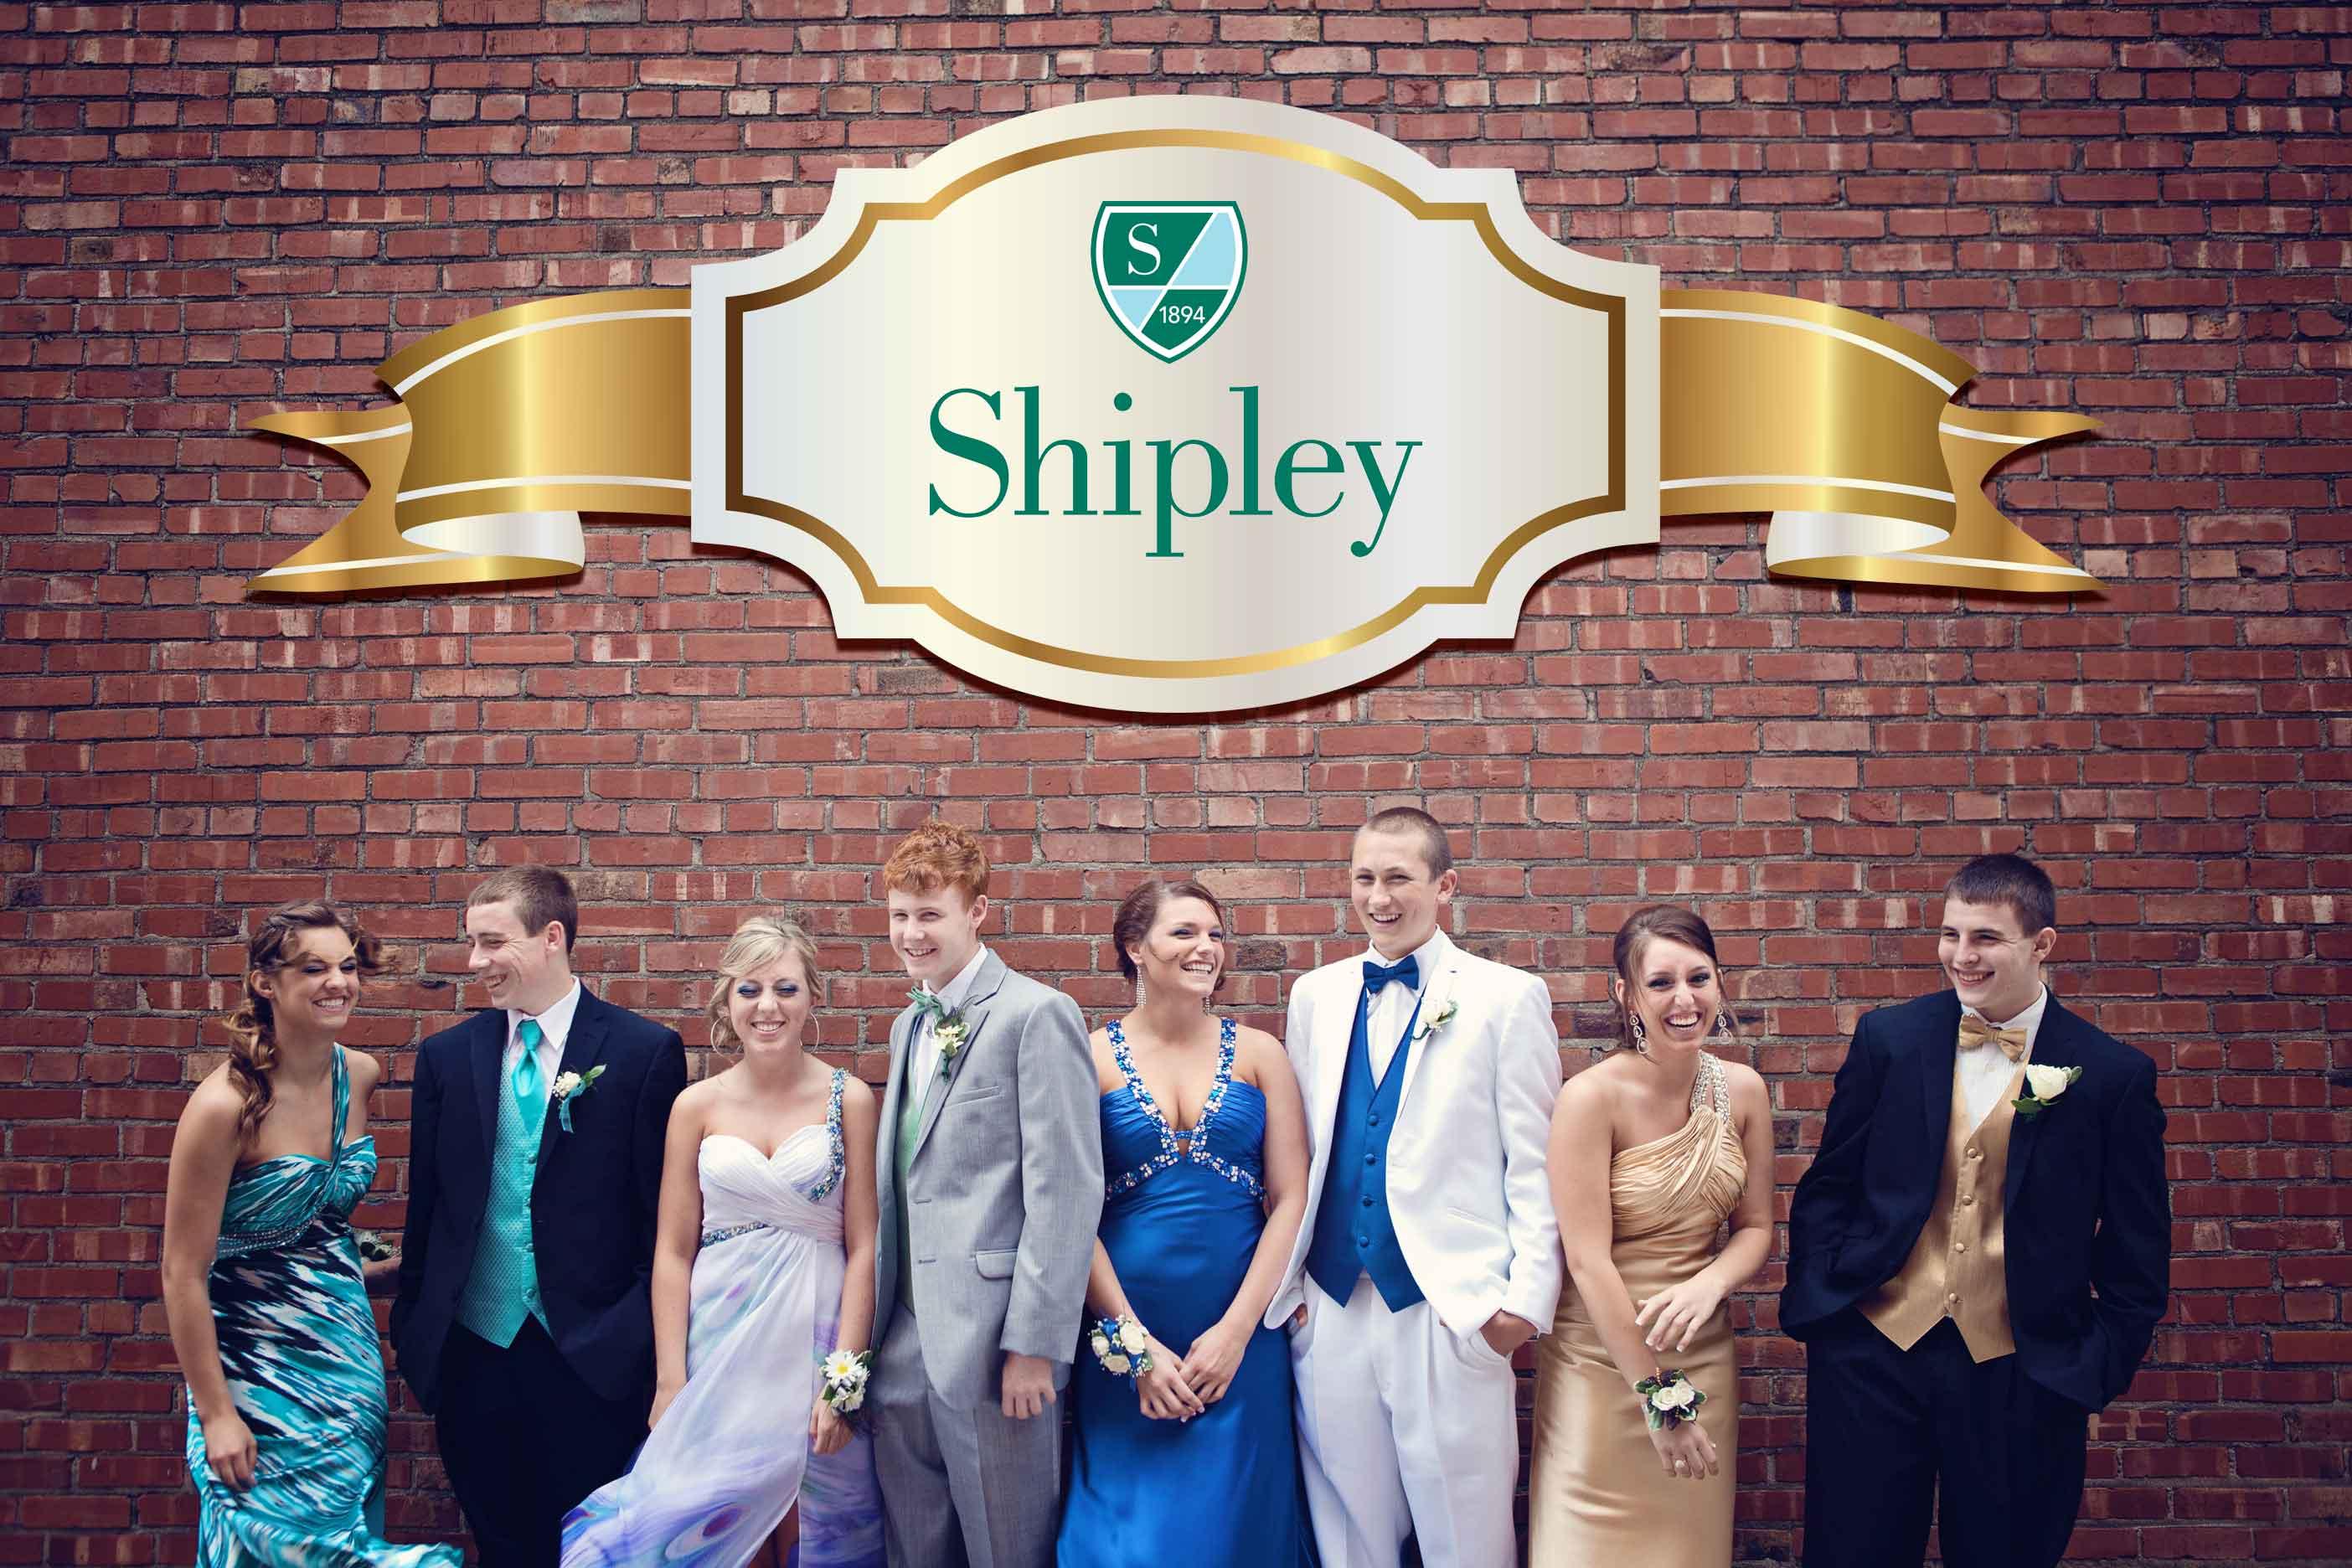 shipley school prom